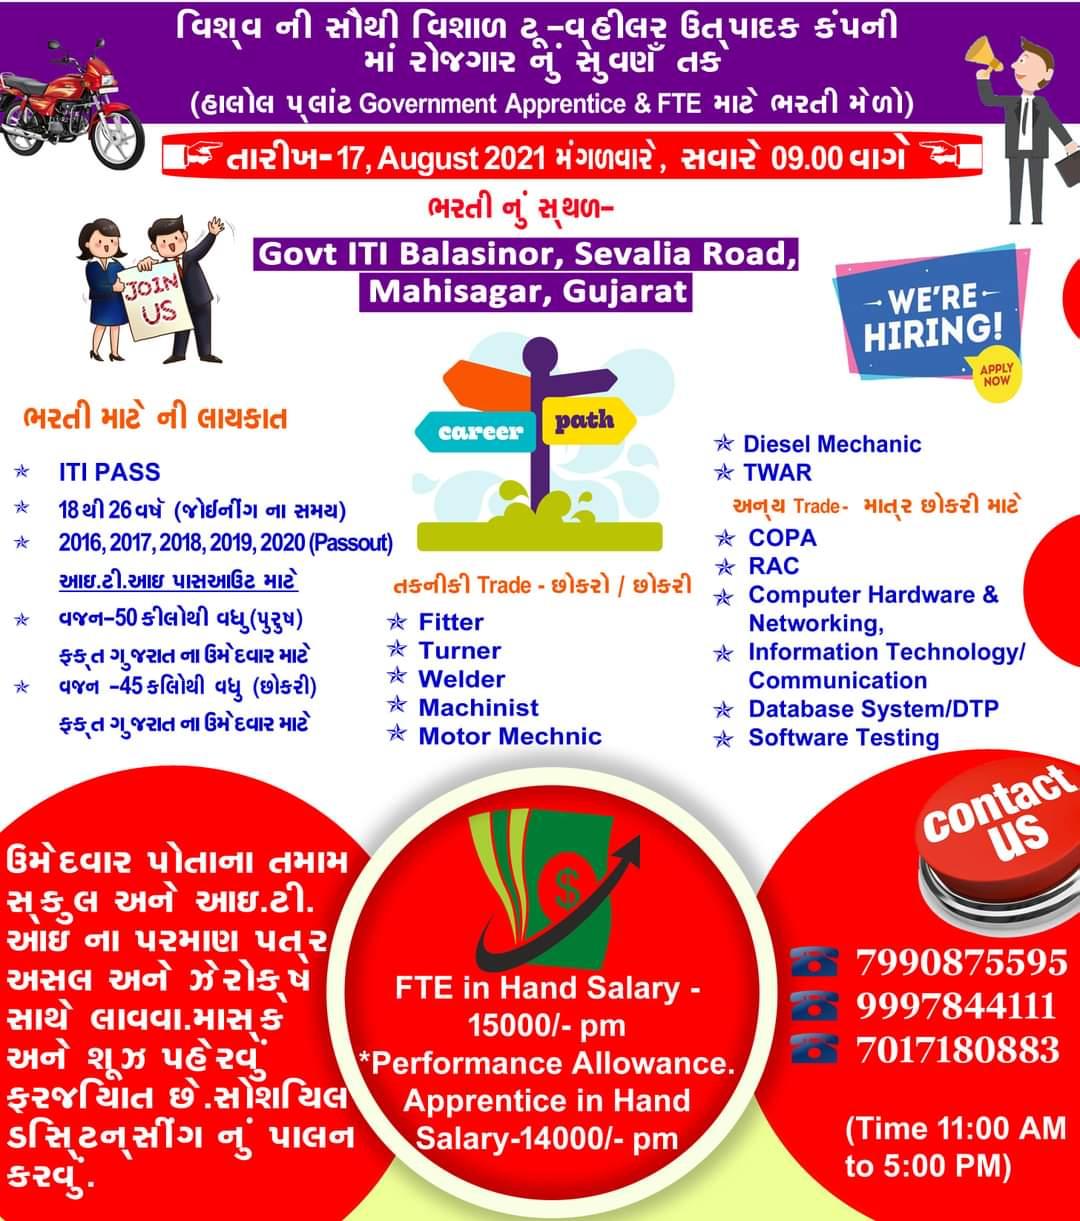 ITI Jobs Campus Placement Drive at Govt ITI Balasinor, Gujarat For Hero MotoCorp Two Wheeler Manufacturing Plant Halol